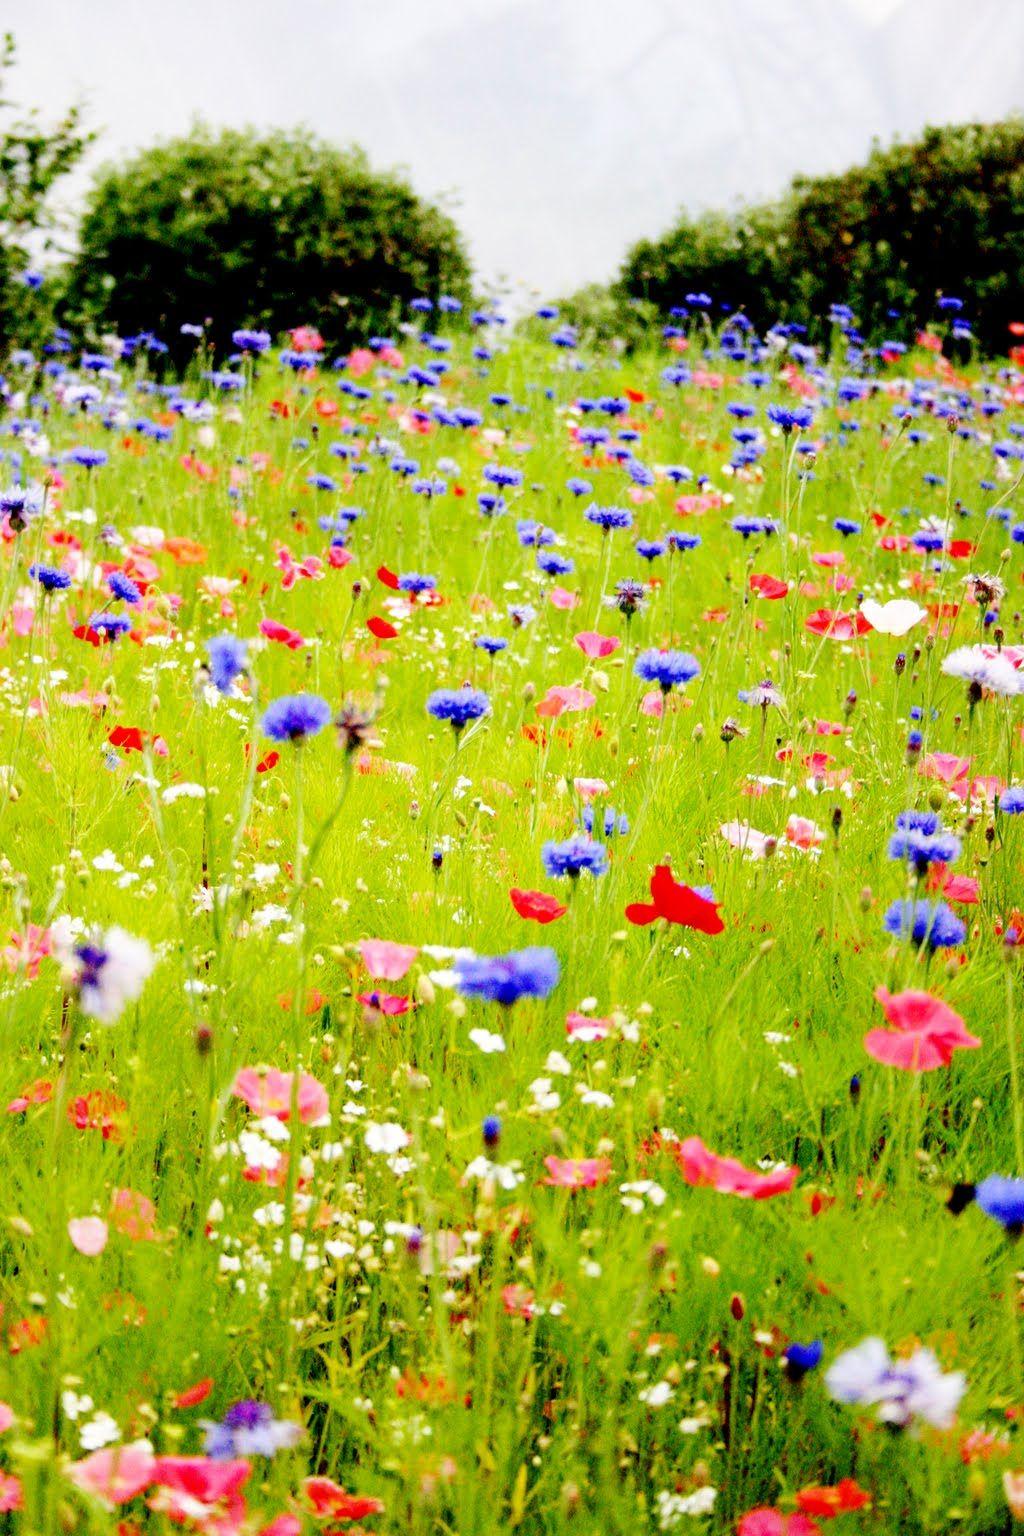 You u me baby pickin wild flowers paisajes y jardines pinterest